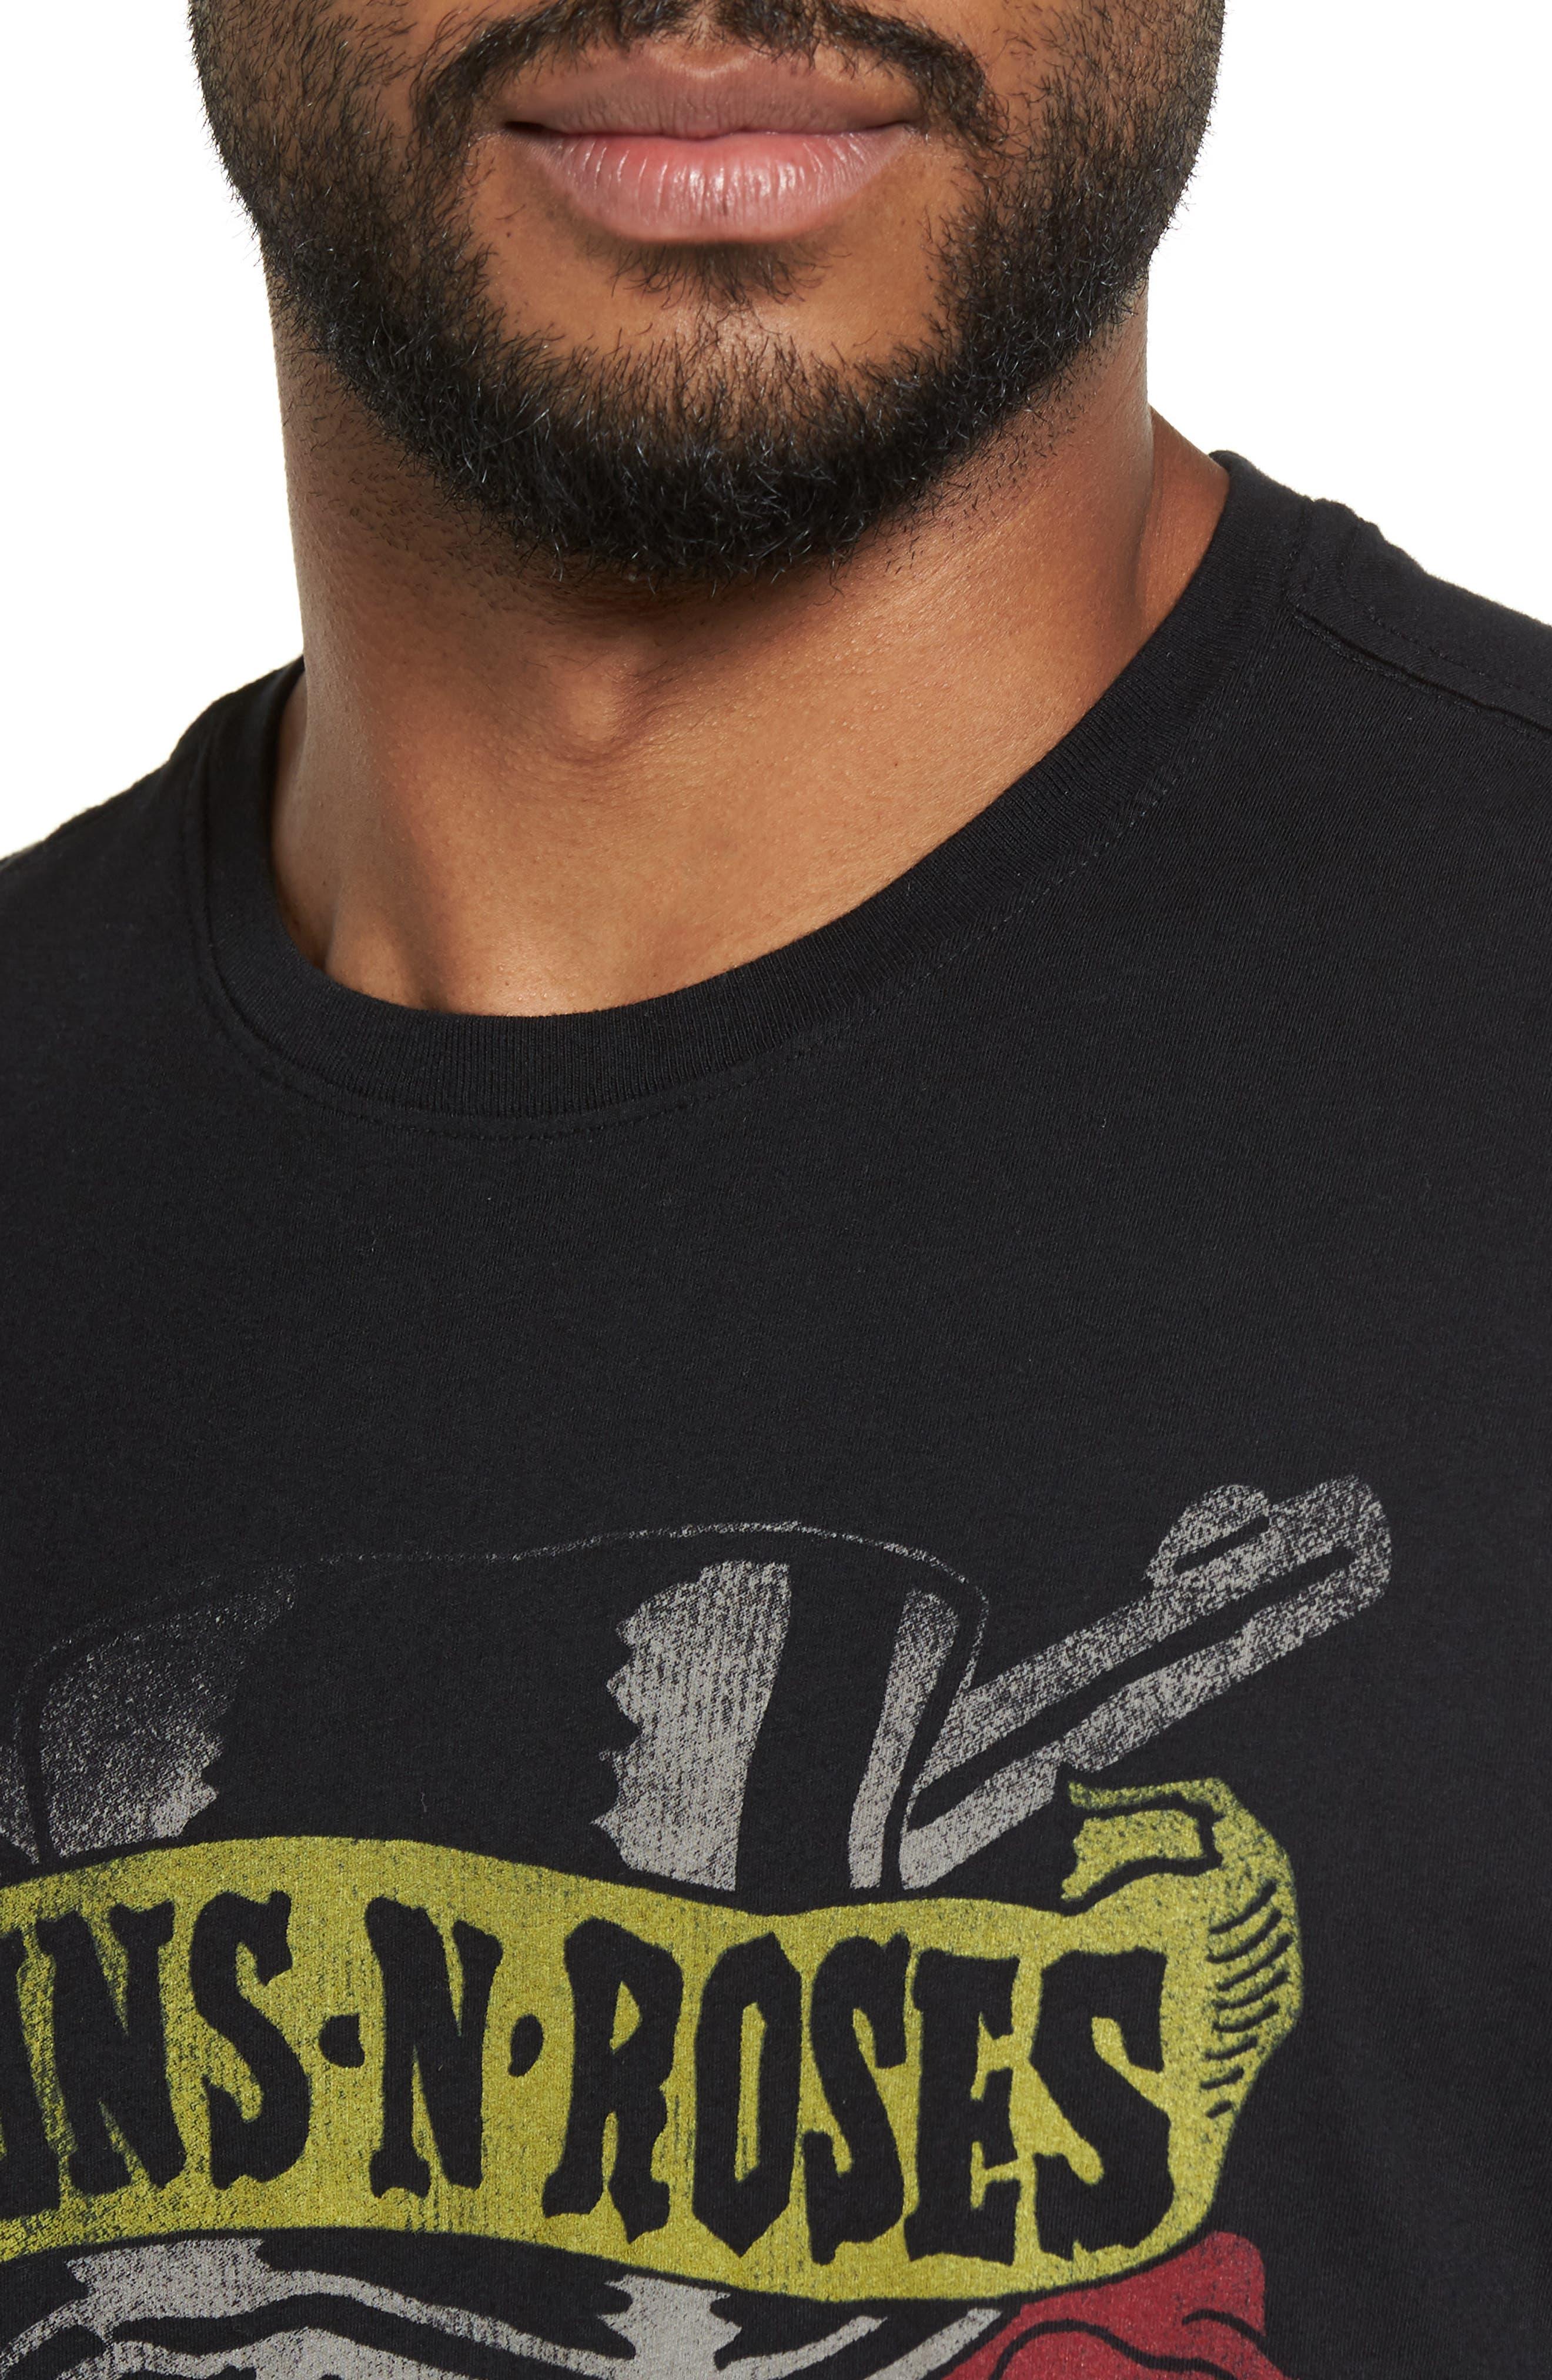 John Varvatos Guns N' Roses Graphic T-Shirt,                             Alternate thumbnail 4, color,                             Black